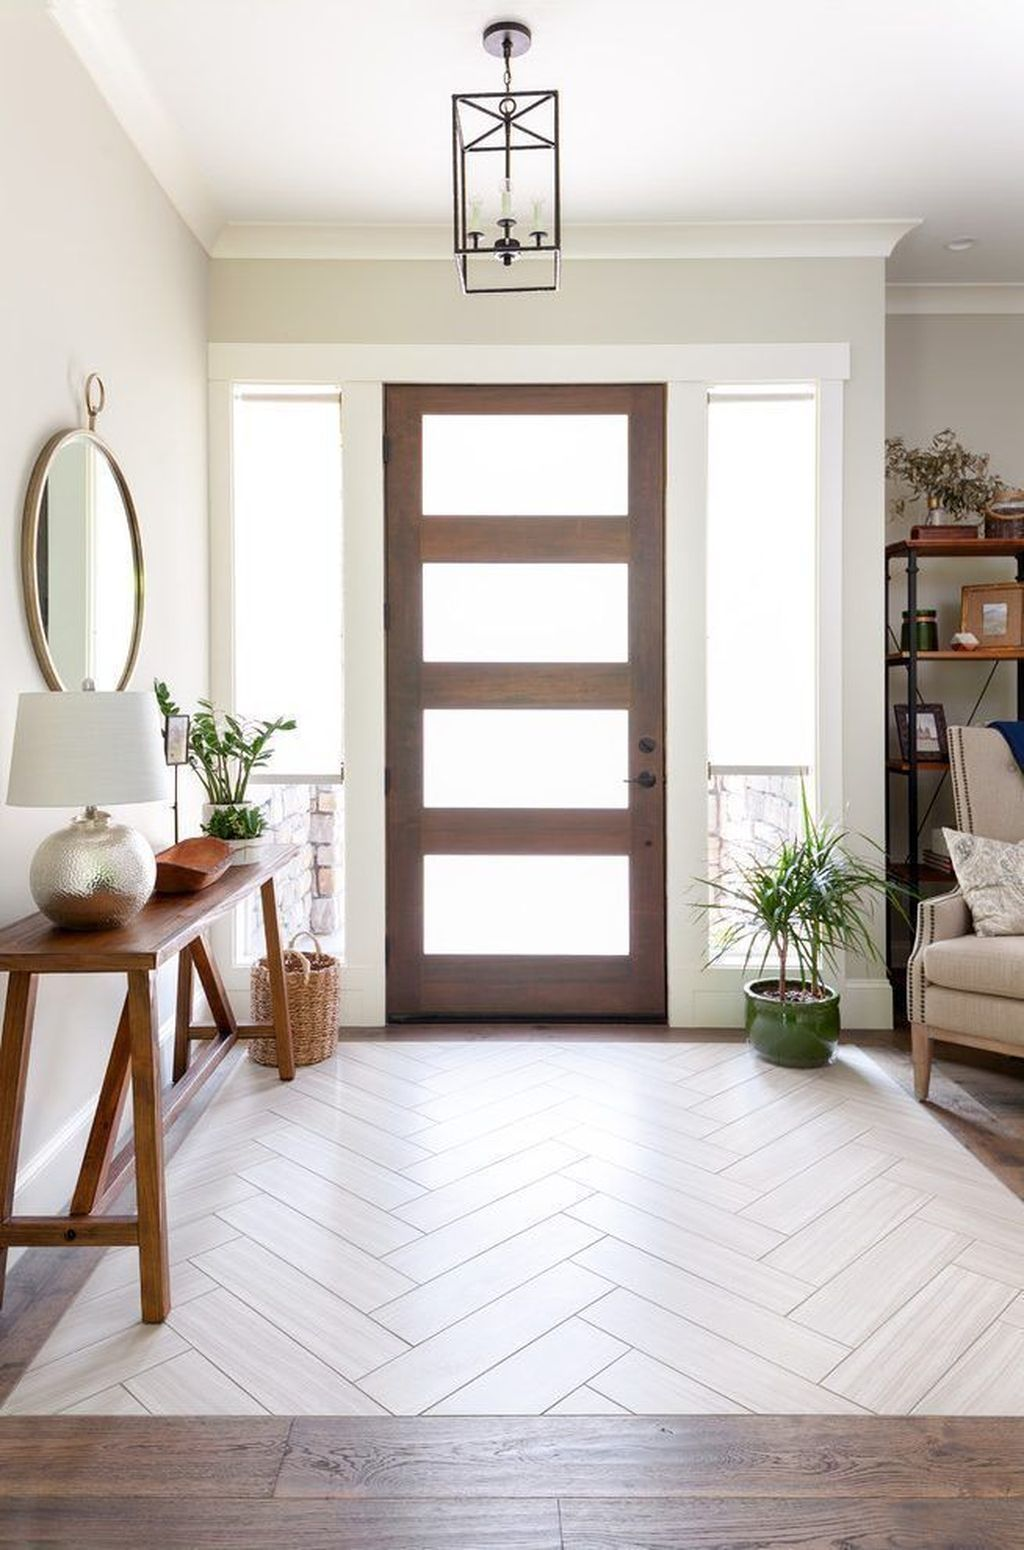 50 Creative Farmhouse Design Ideas For Interior Pickndecor Com